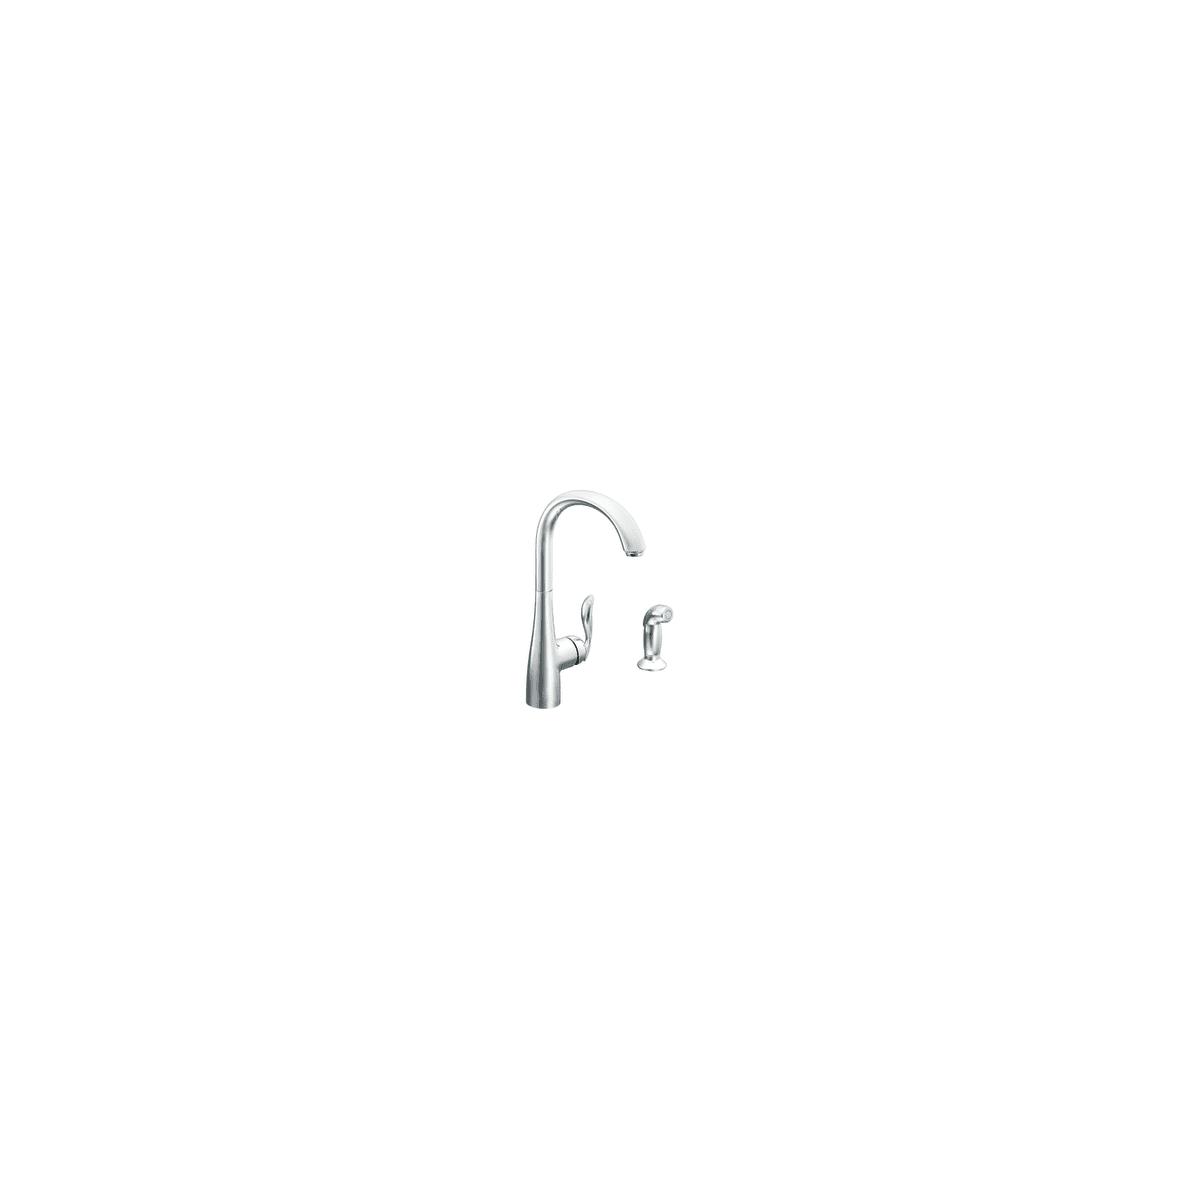 Moen 7790orb Oil Rubbed Bronze Arbor Single Handle High Arc Kitchen Faucet Faucetdirect Com